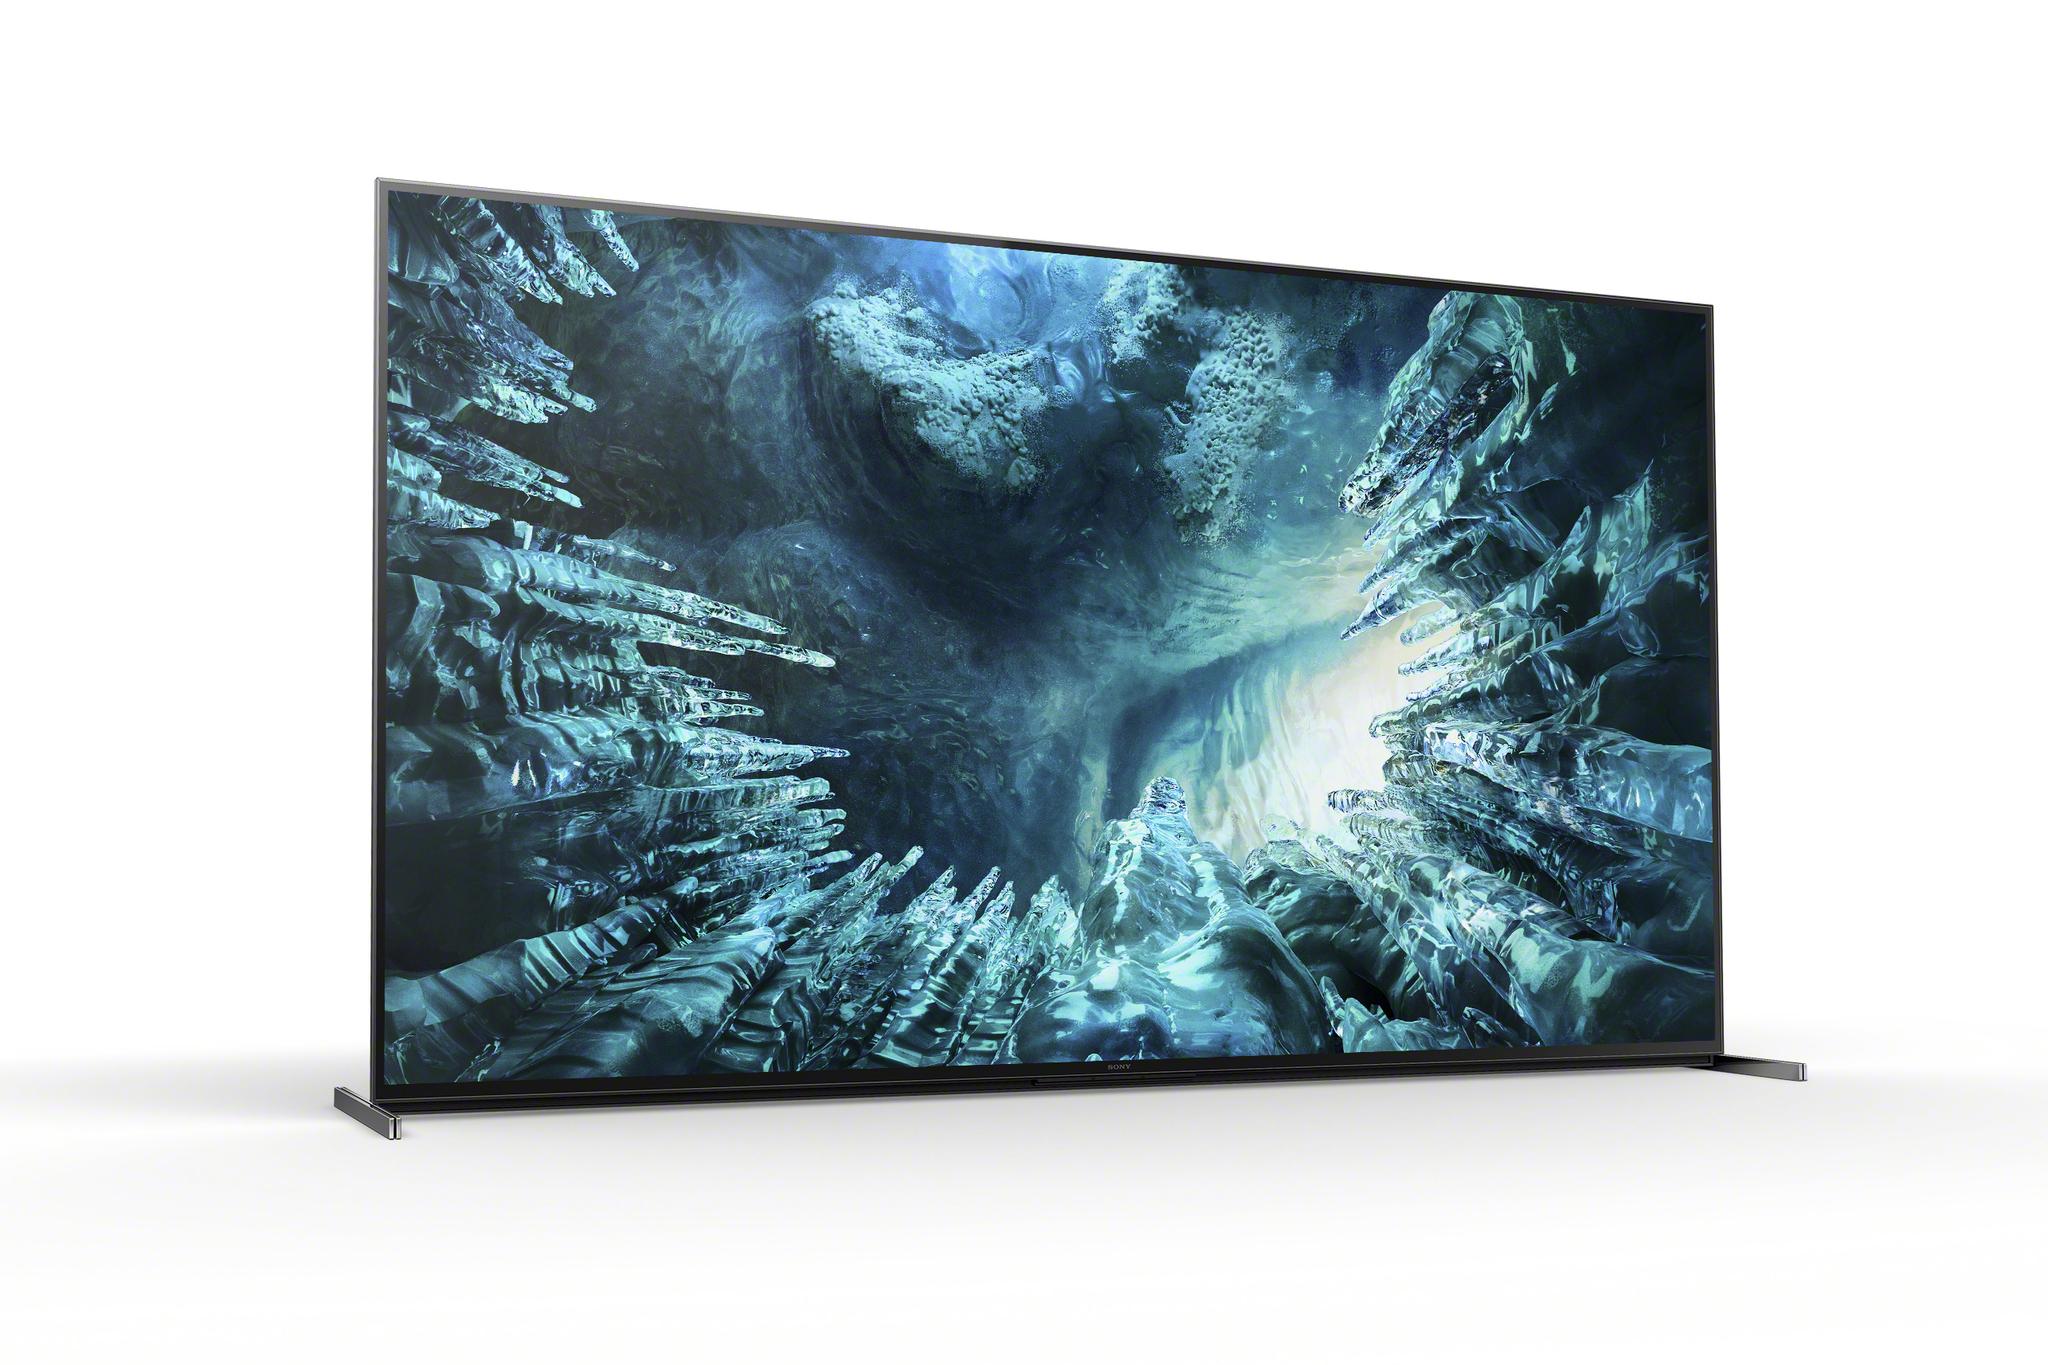 KD-85ZH8 8K HDR телевизор Sony Bravia в Sony Centre Воронеж